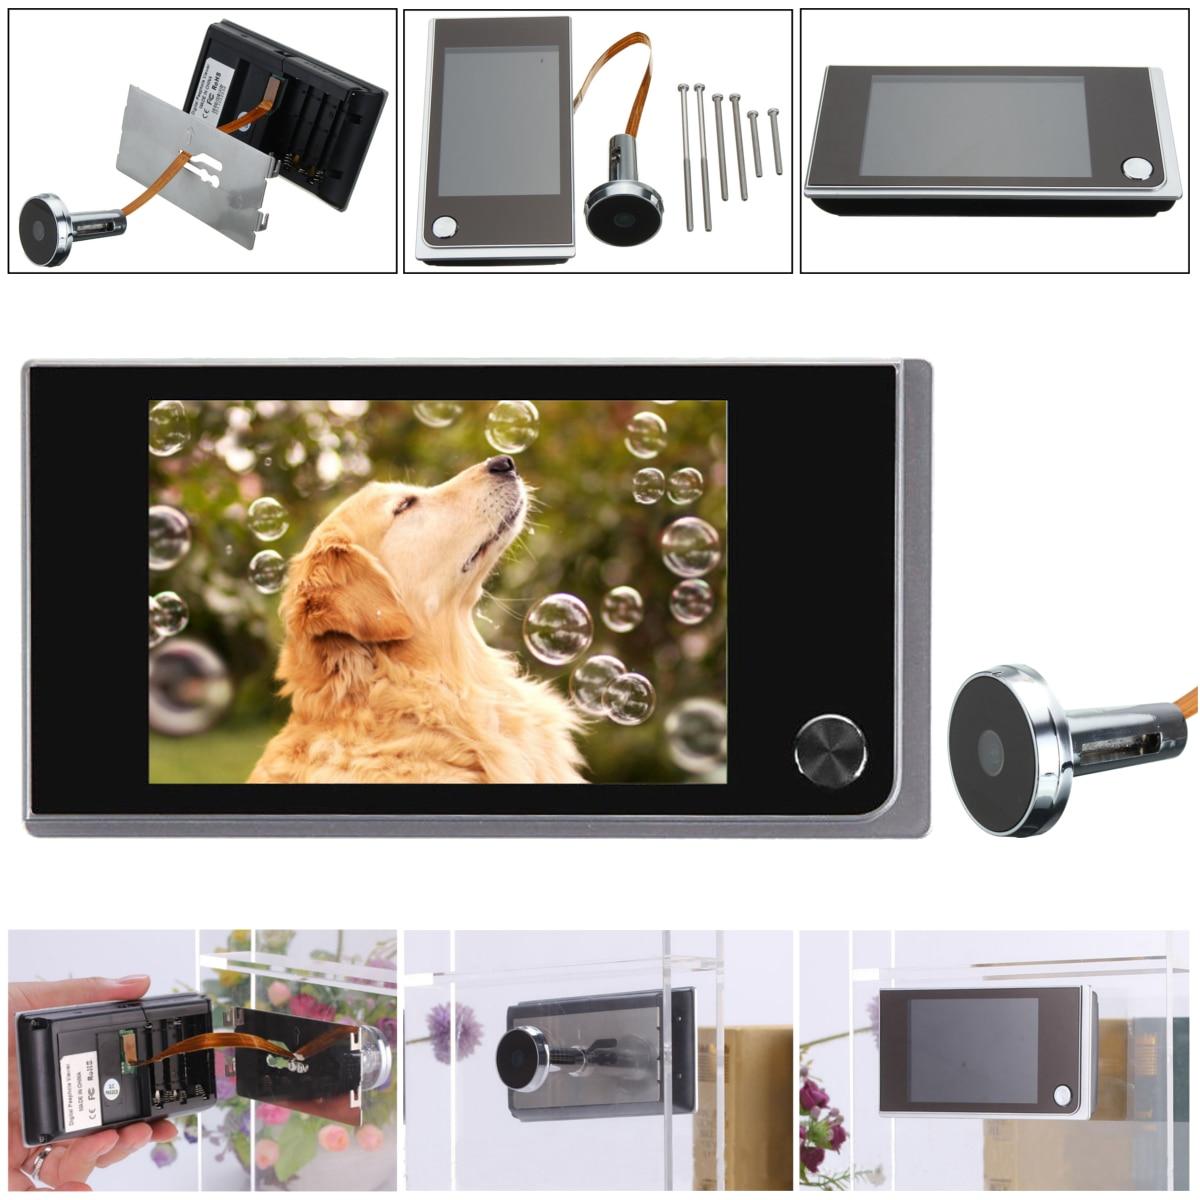 3 5inch Digital 120 Door Peephole Peep Hole Video Doorbell Viewer Camera Monitor